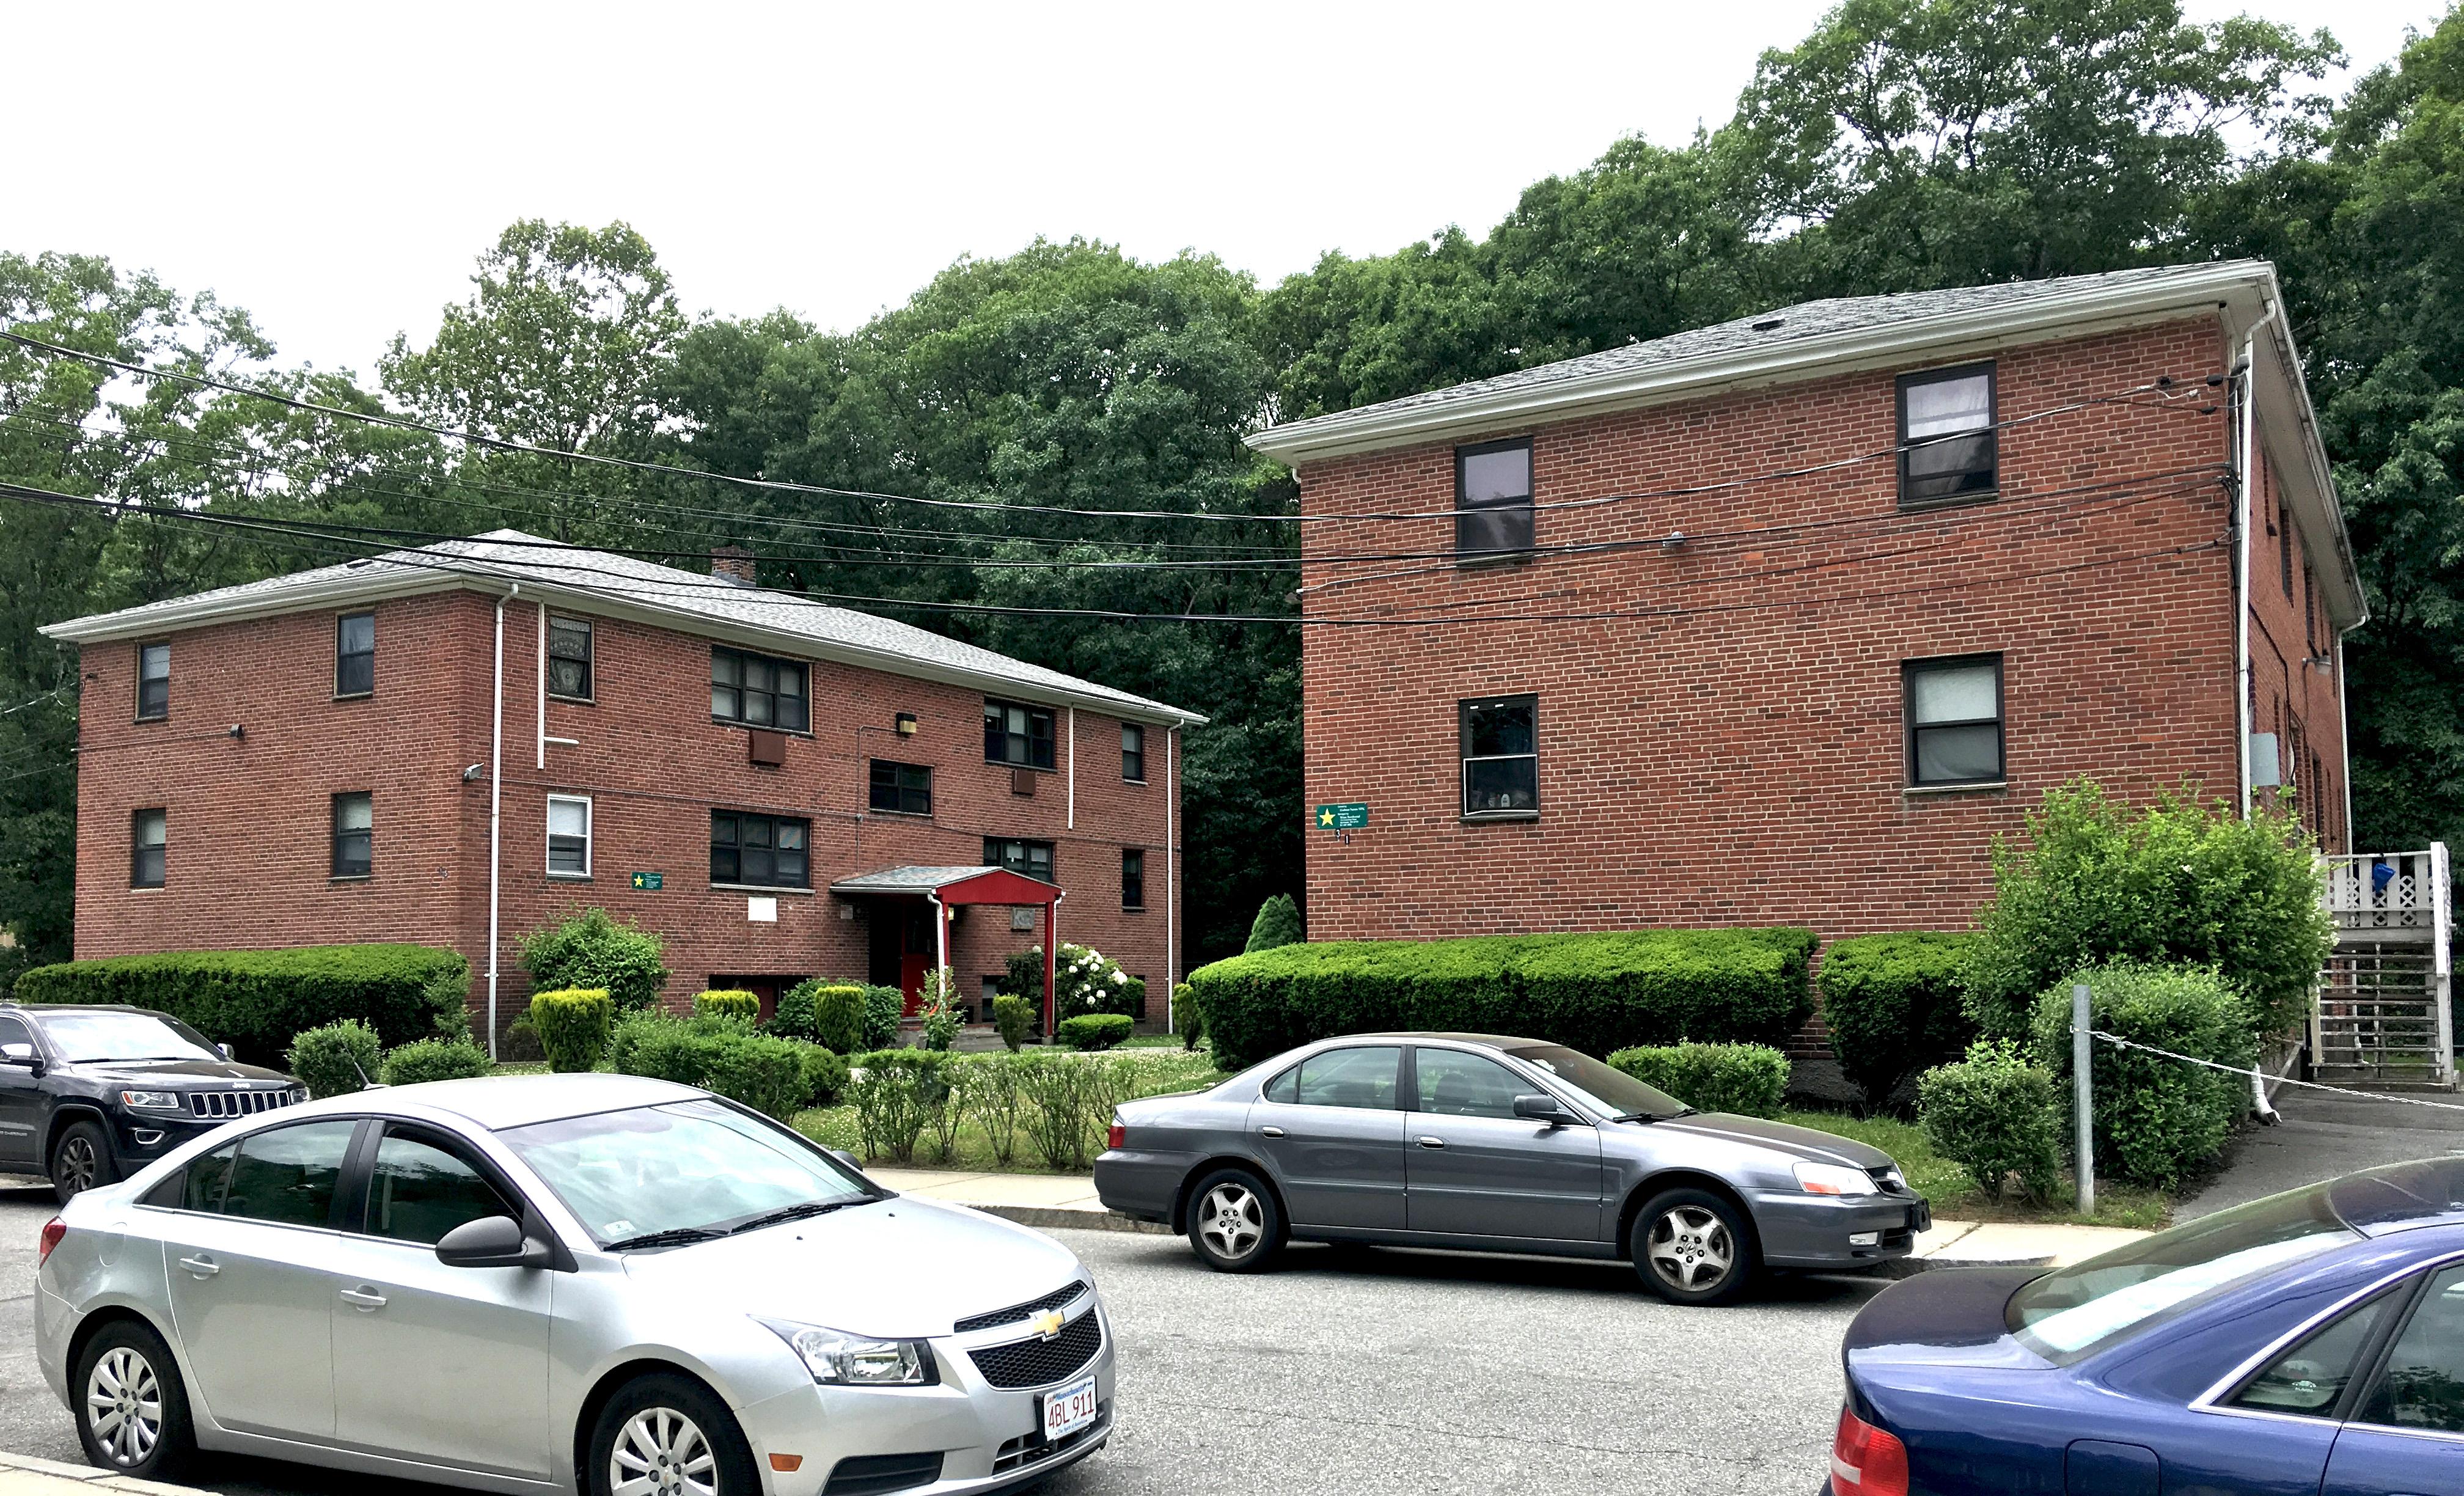 Affordable Housing Rehabilitation for CSNDC, Boston